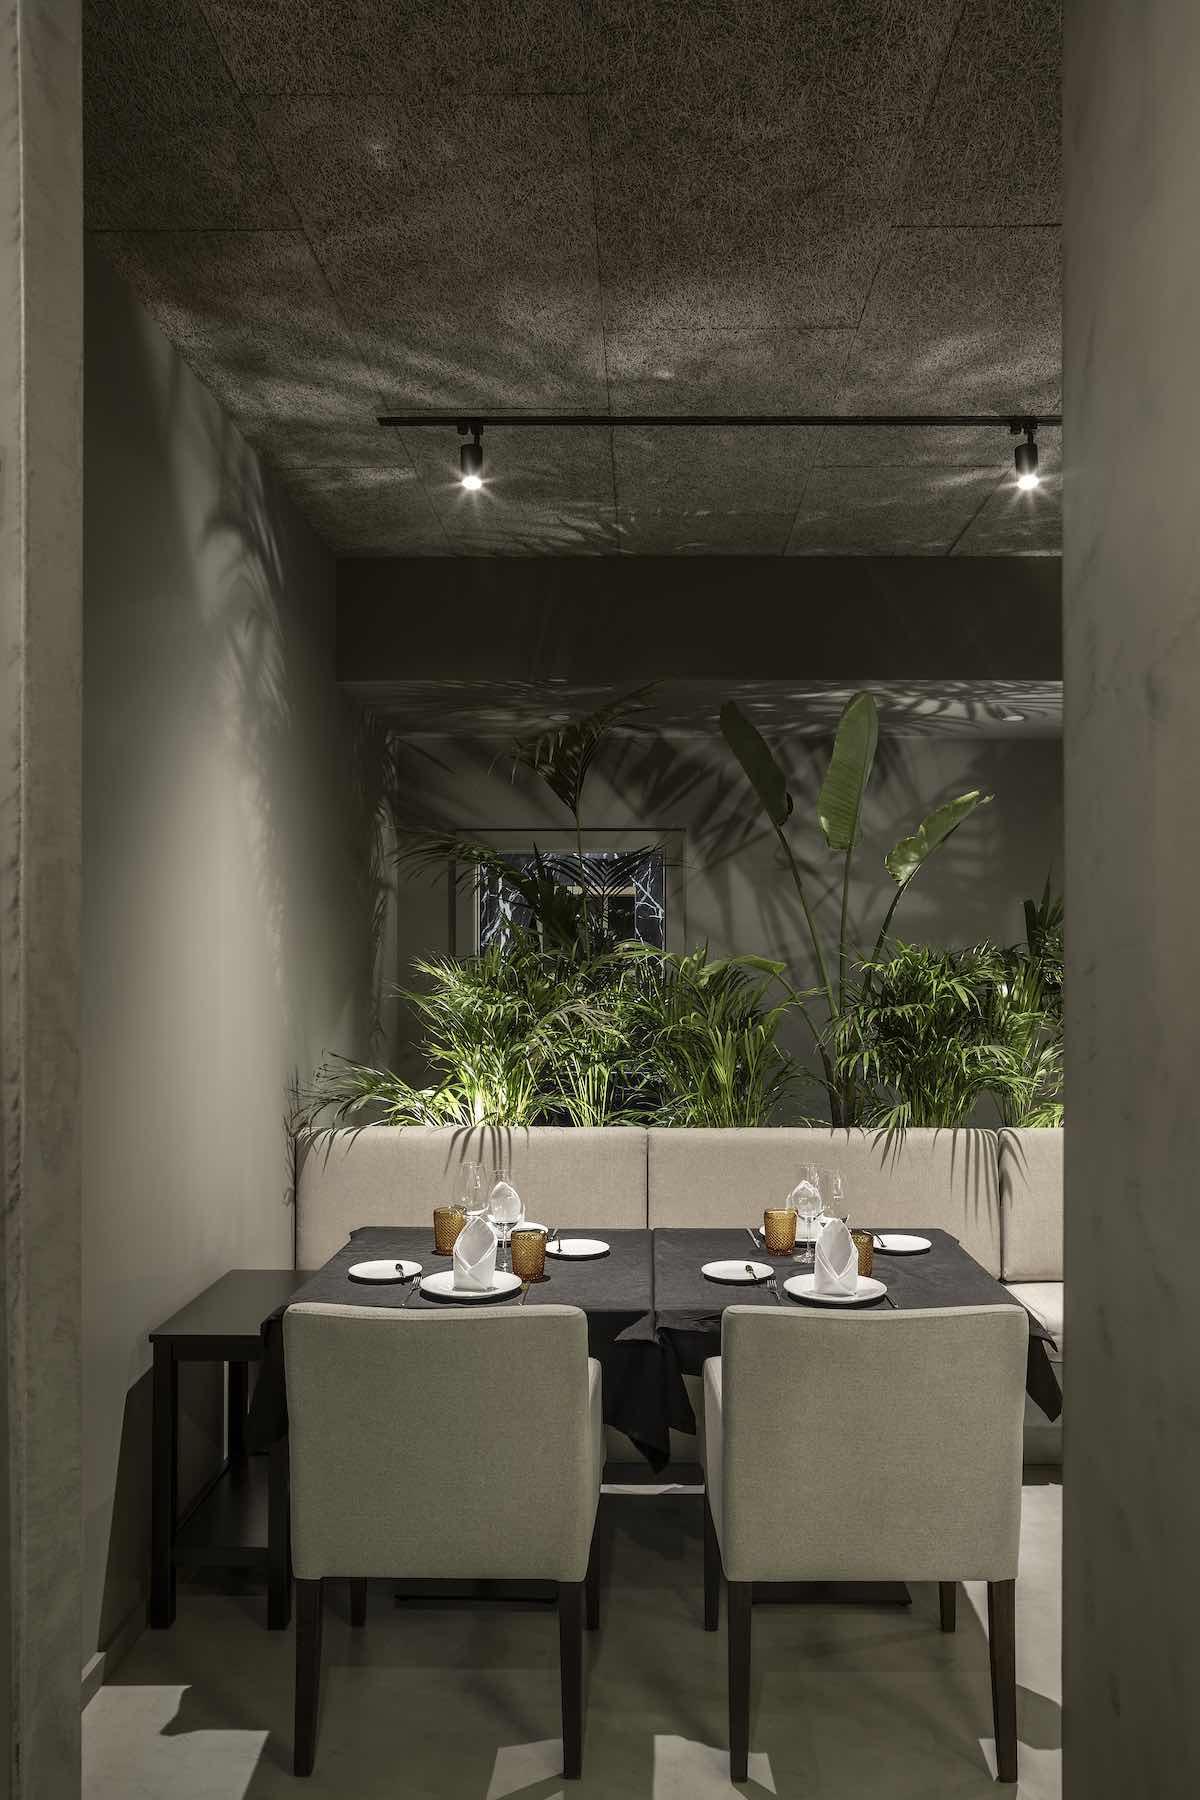 FAMA_Restaurant_Paulo_Martins_Arquitectura_and_design_AmazingArchitecture_%20015.jpg